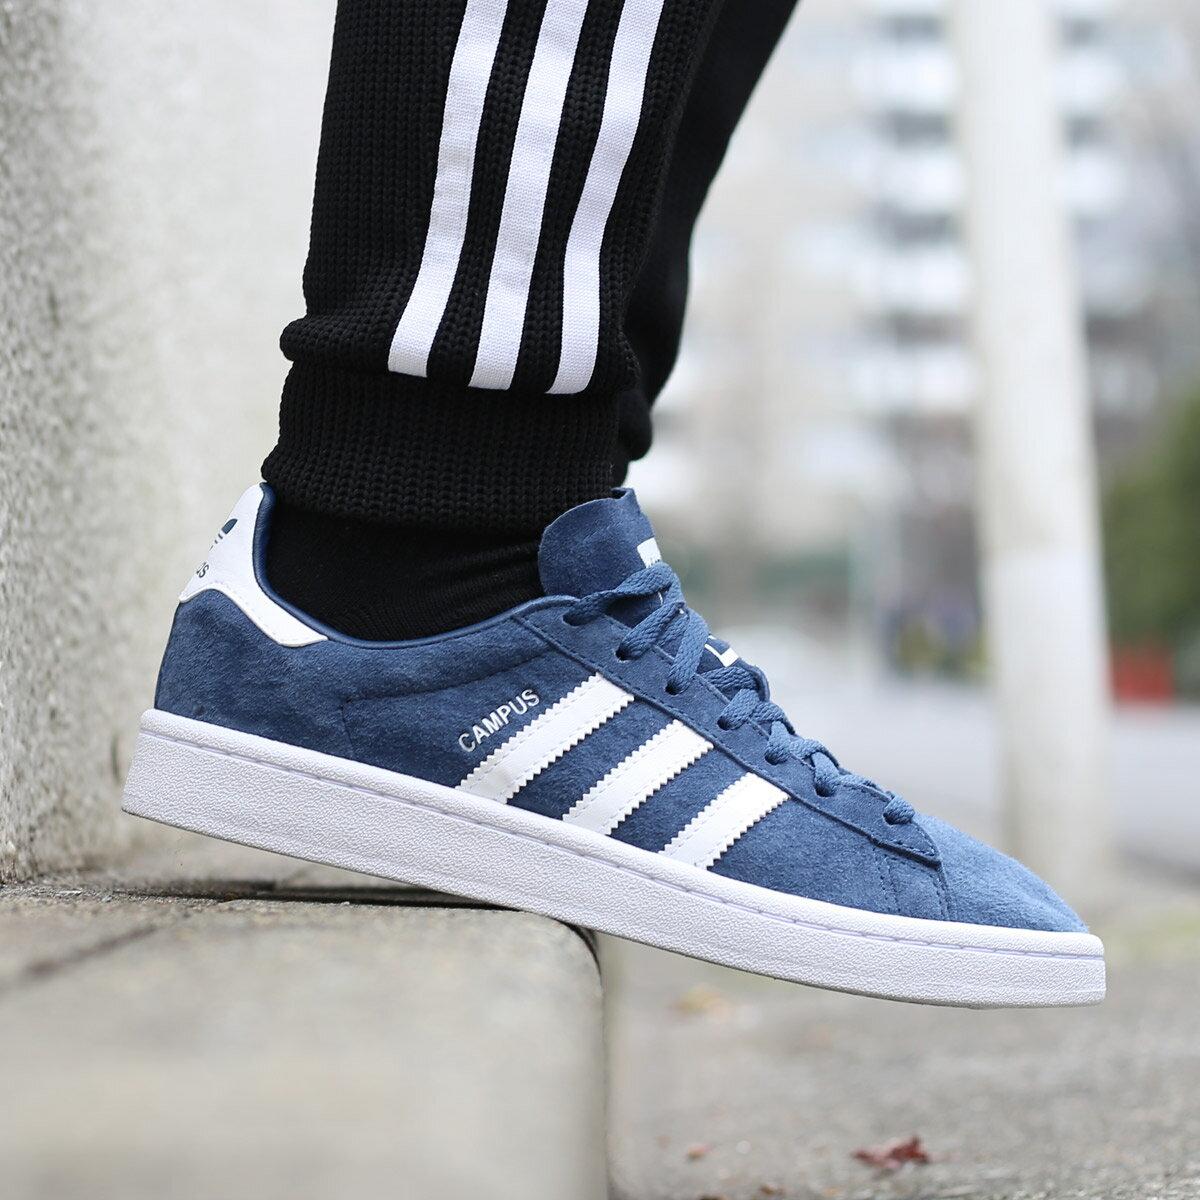 adidas Originals CAMPUS W(アディダス オリジナルス キャンパス W)Mineral Blue/Running White/Running White【メンズ レディース スニーカー】18SS-I